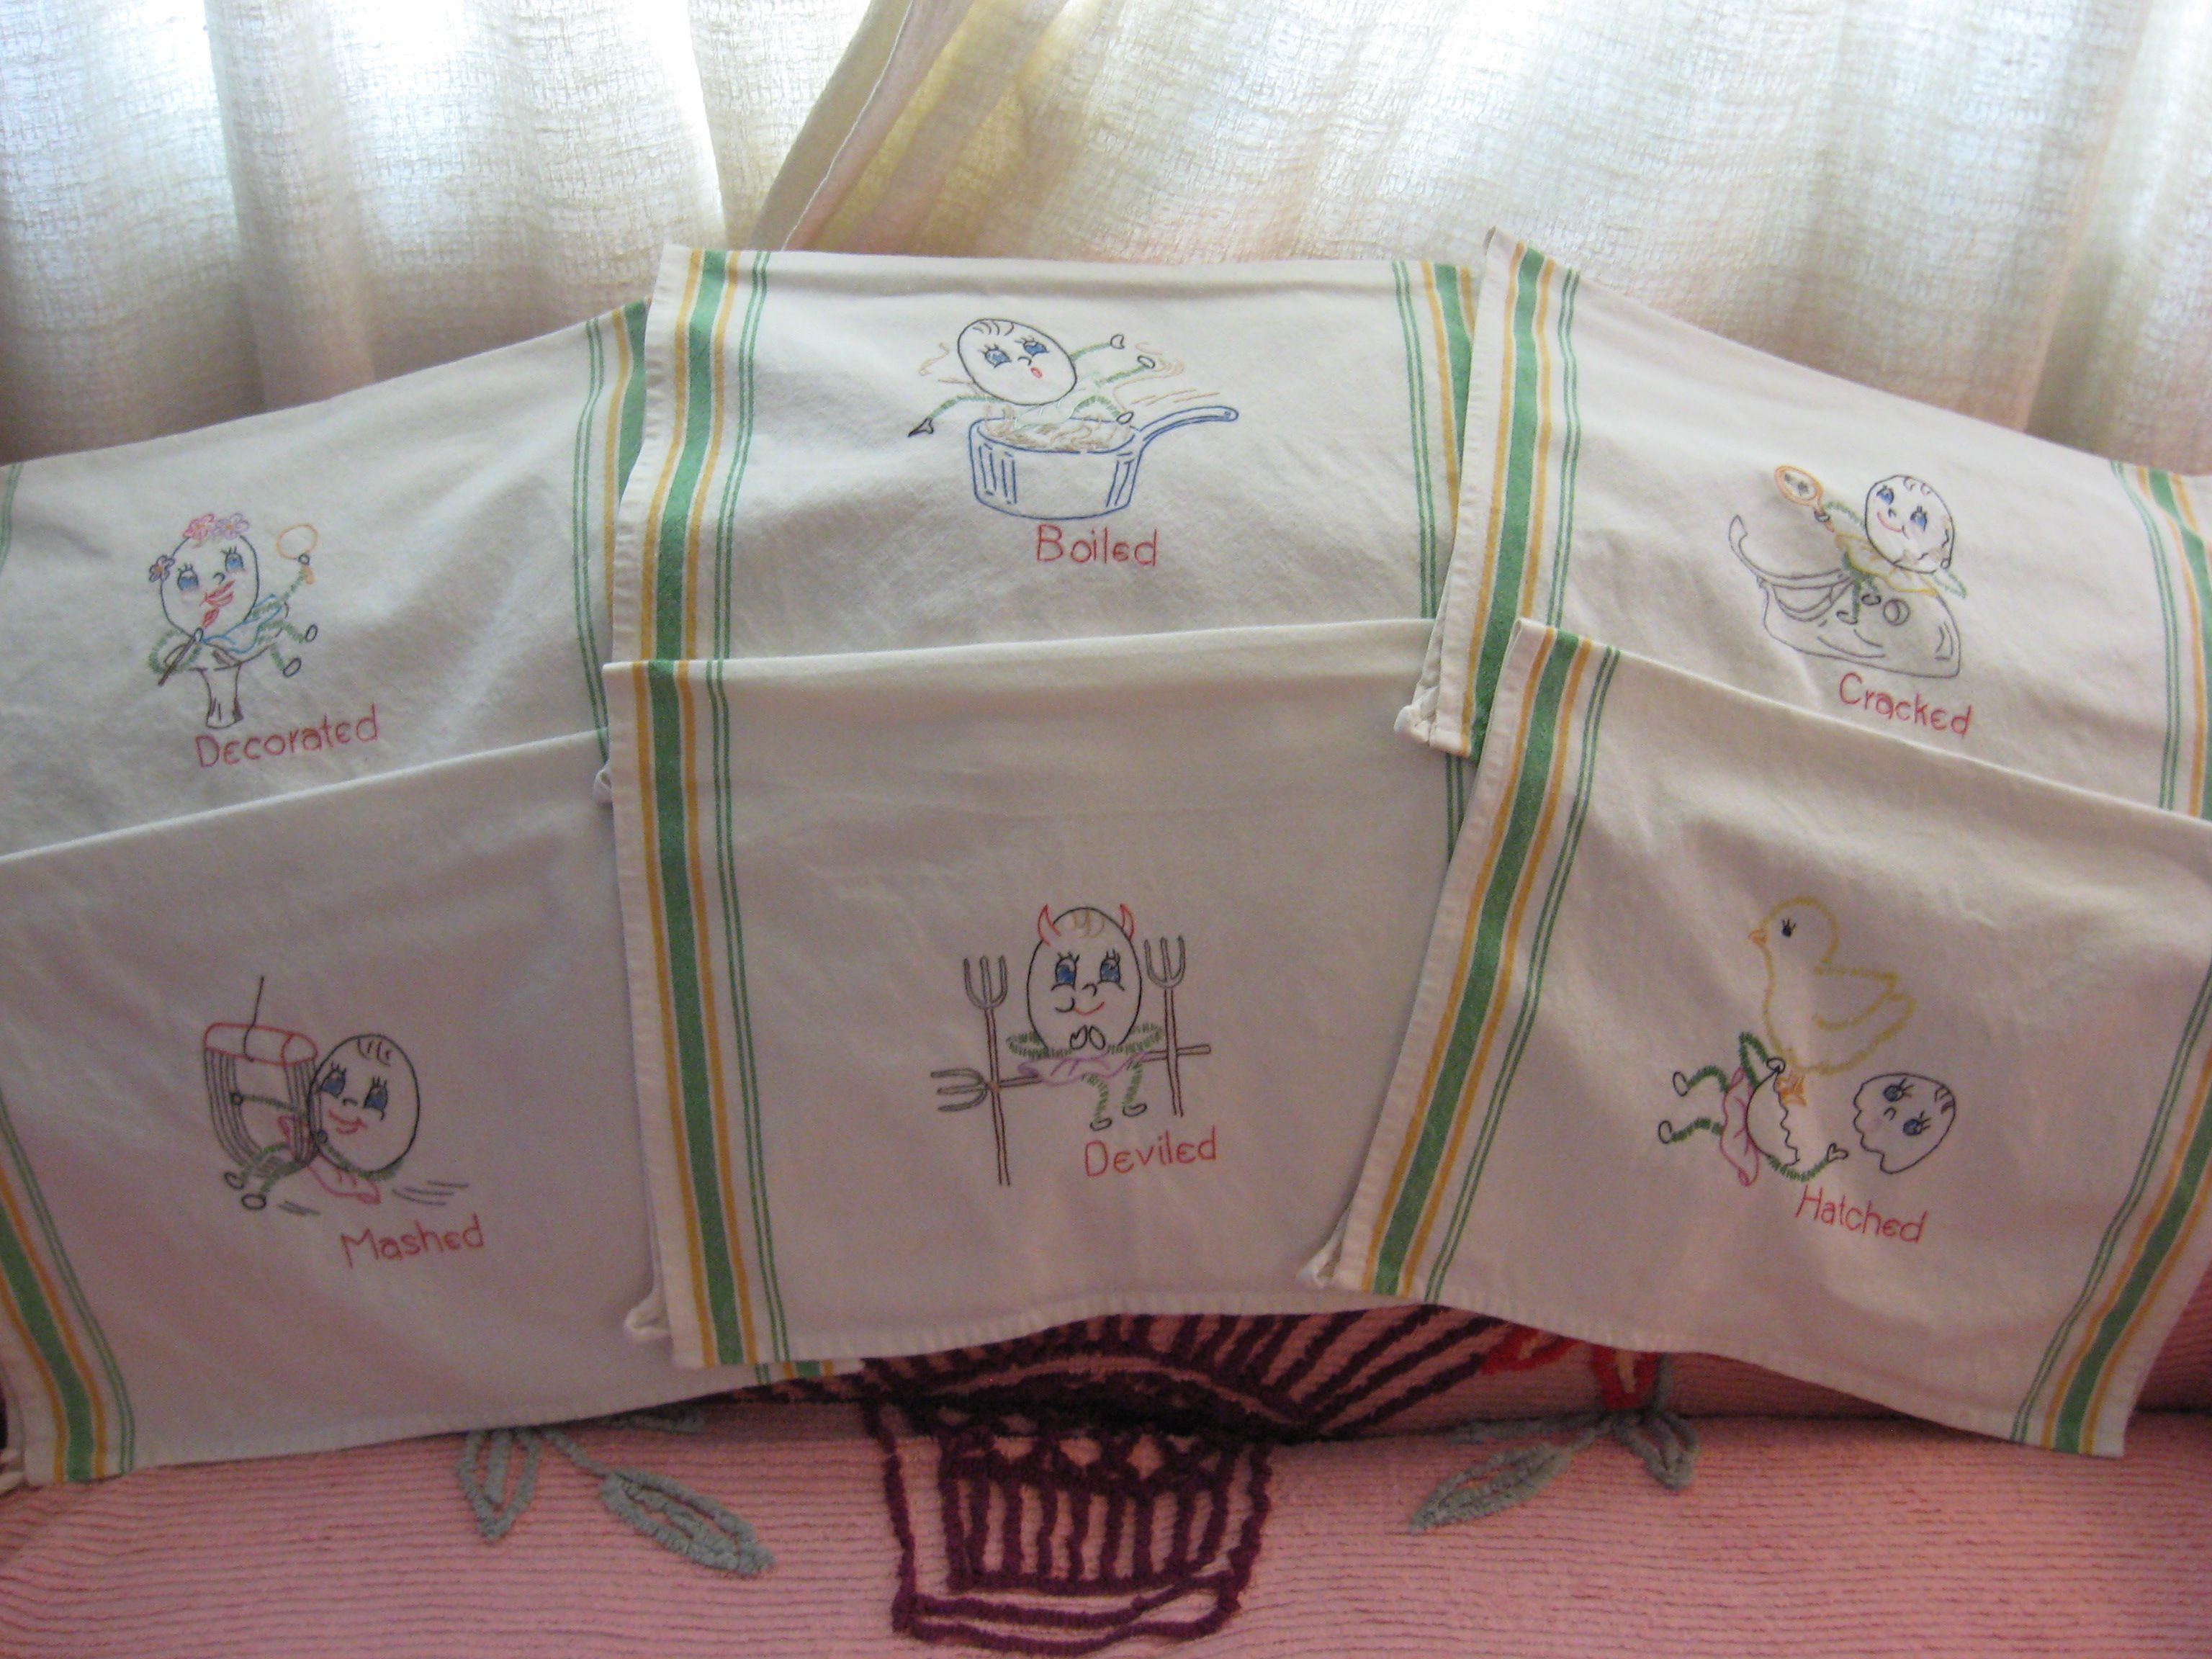 Aunt martha 3706 egg motifs for tea towels a 1940s hand aunt martha 3706 egg motifs for tea towels a 1940s hand embroidery design vintage embroidery patternshand bankloansurffo Images